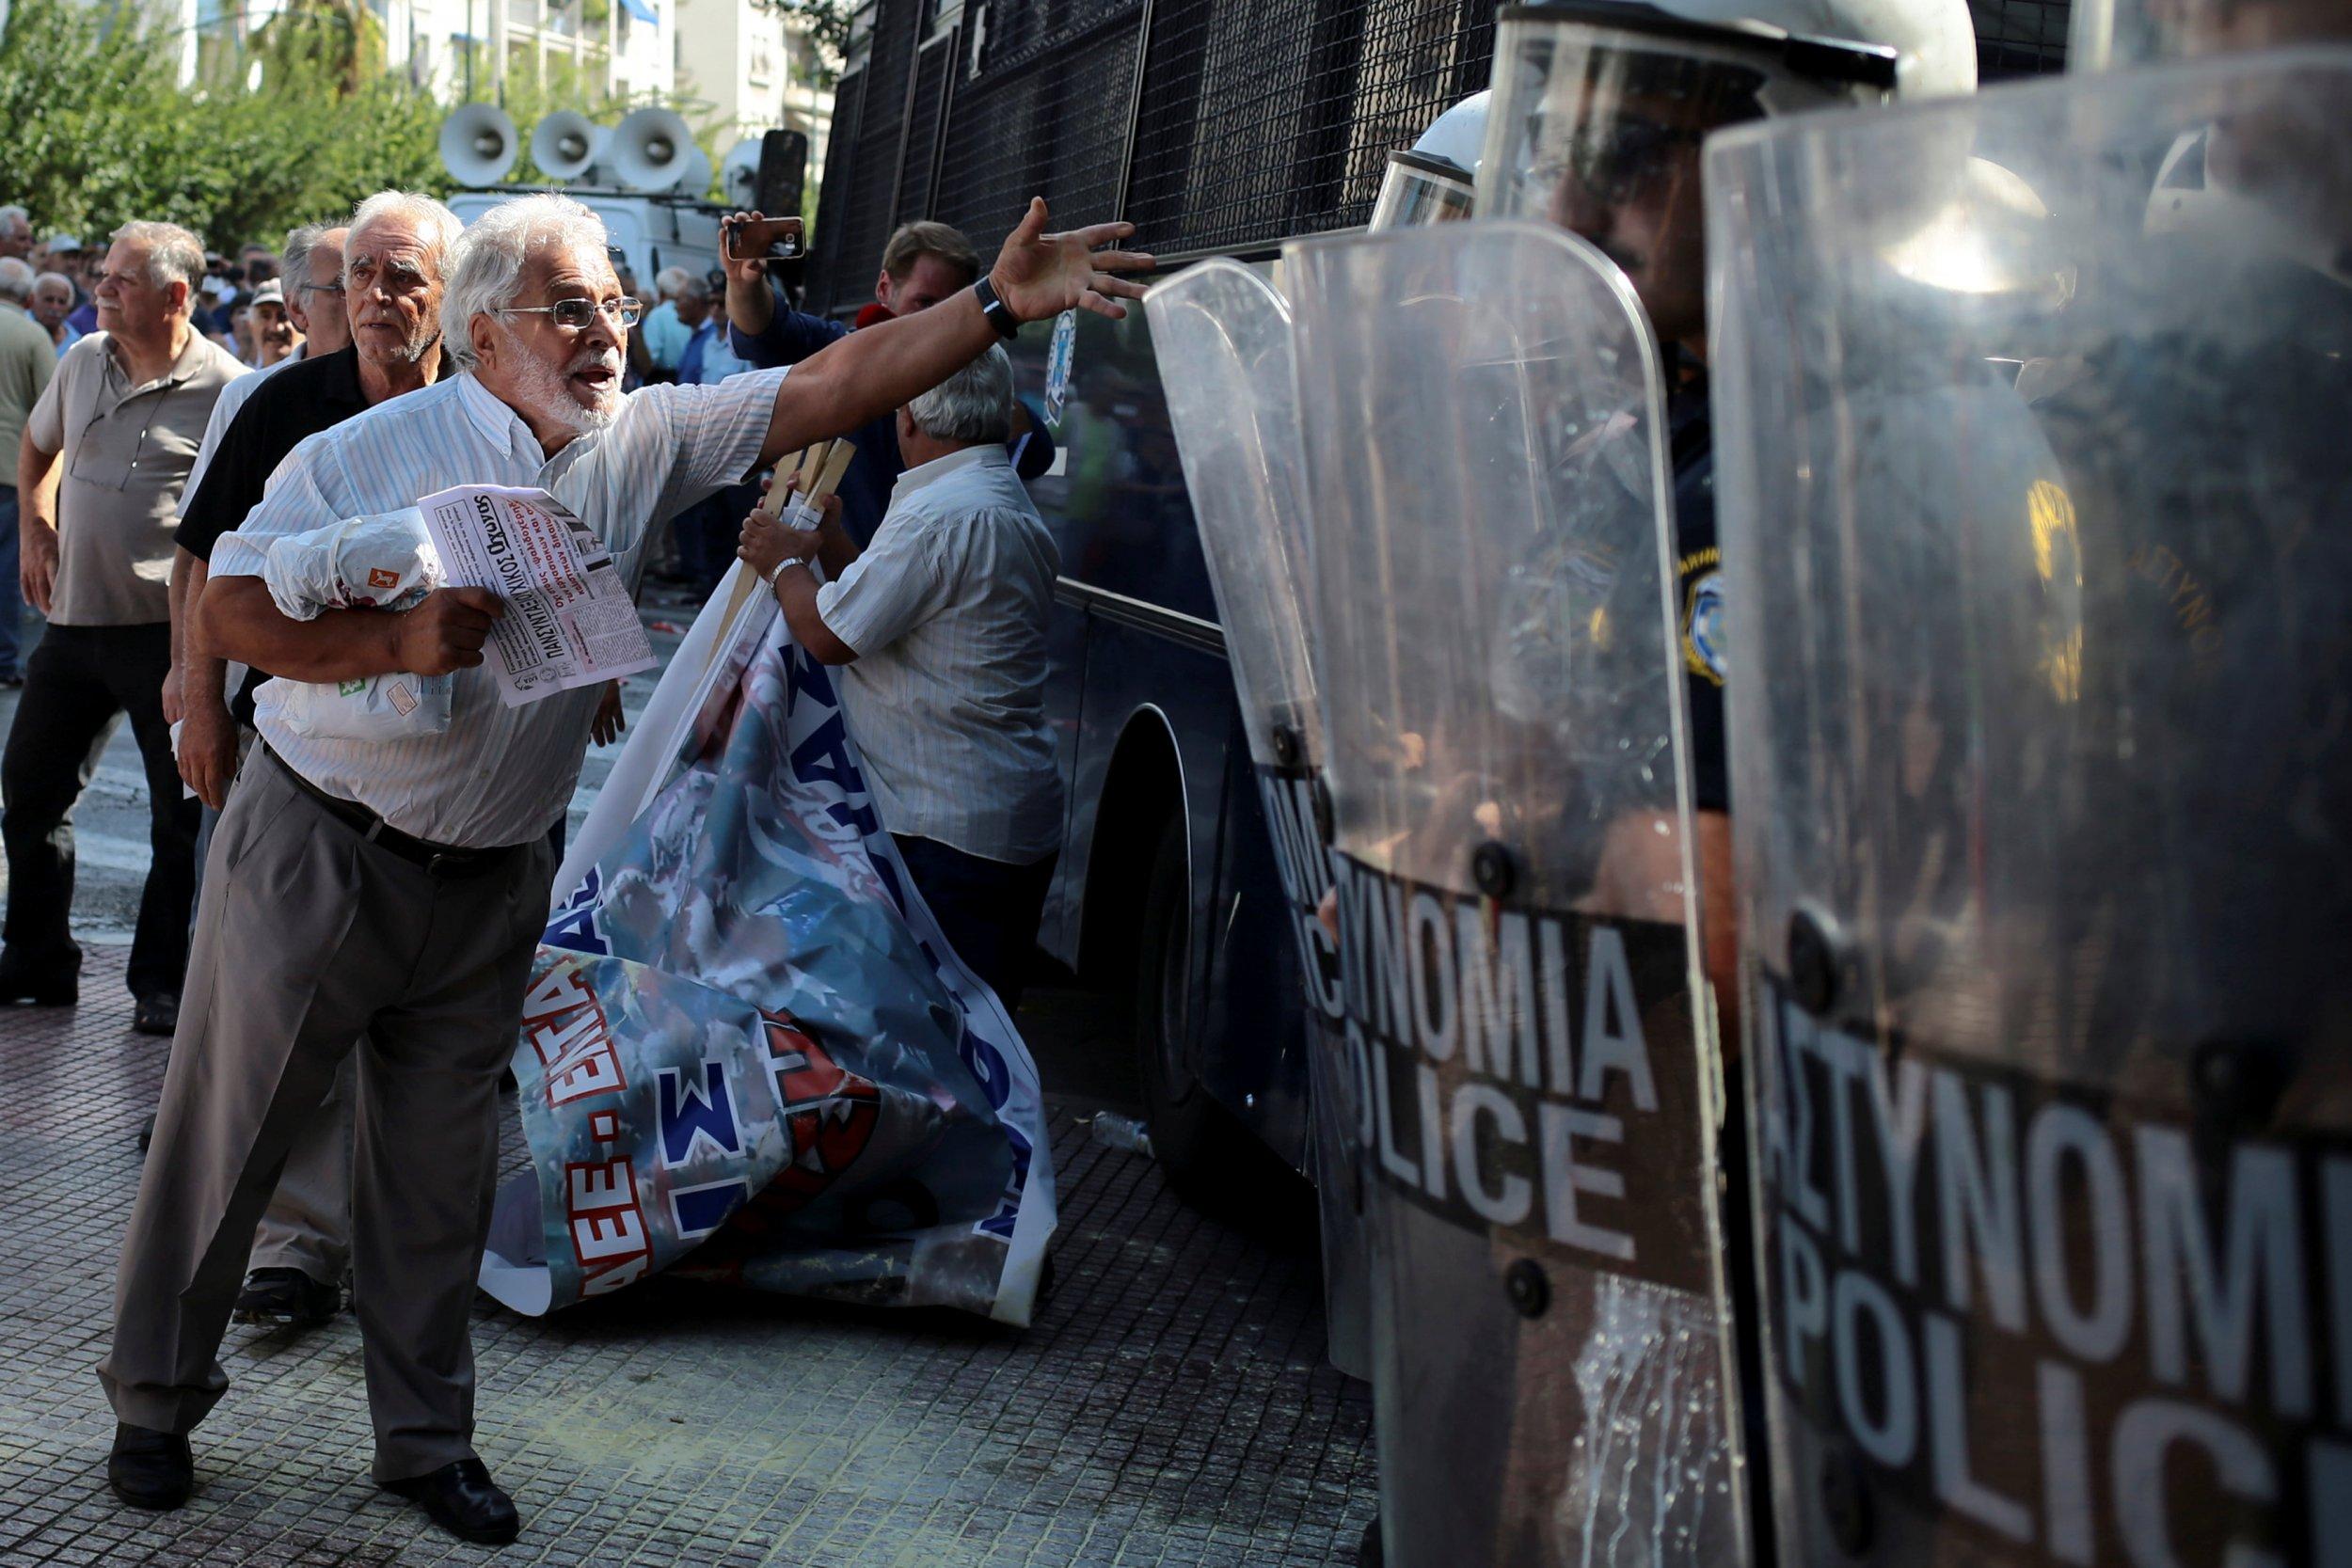 A Greek pensioner protests pension cuts